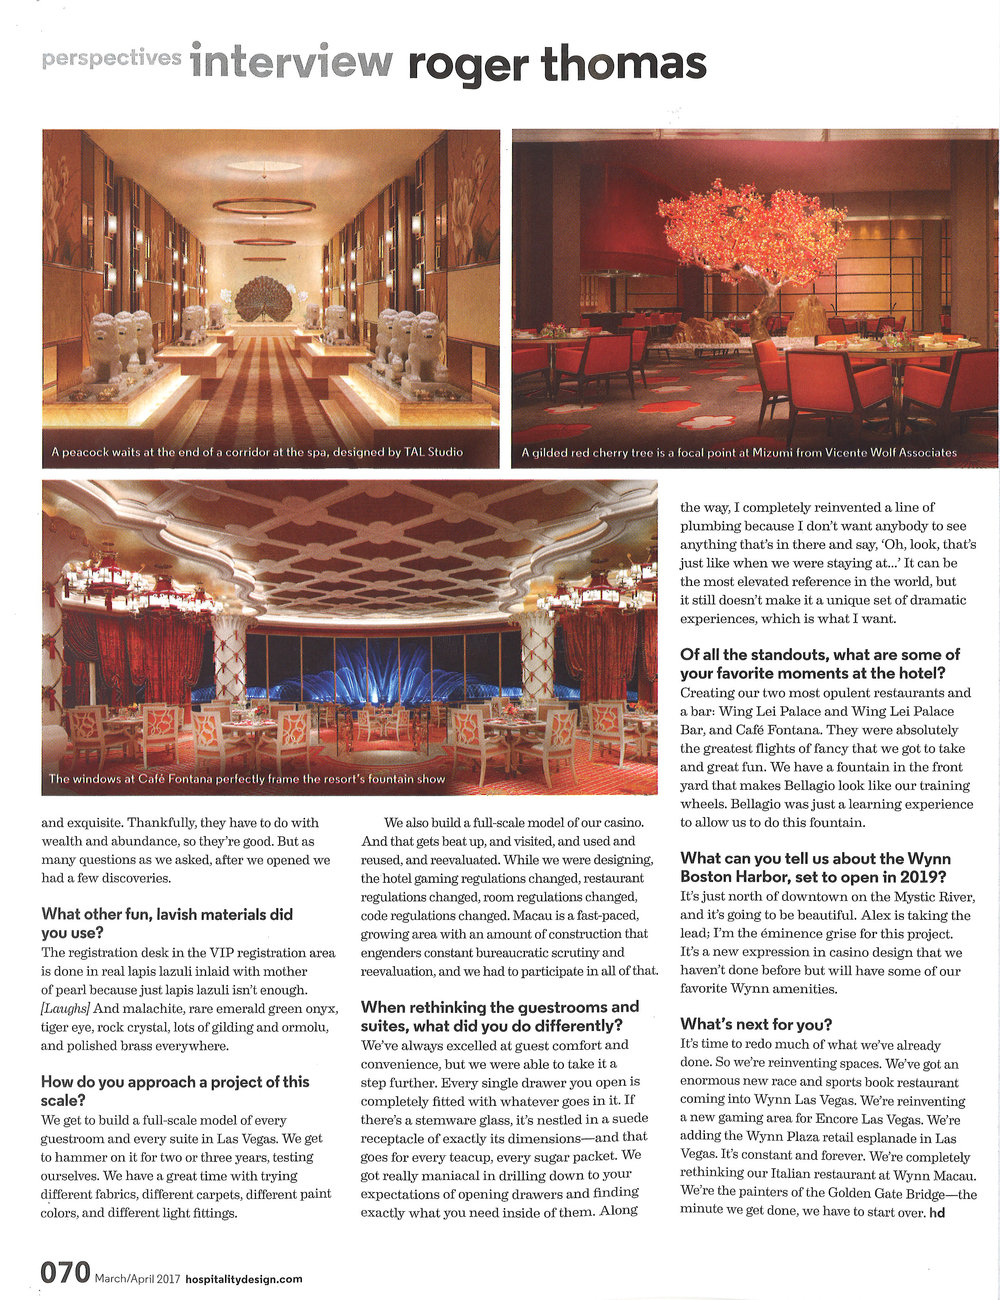 March April_Hospitality Design_Roger Thomas on Wynn Palace Cotai_pg2.jpg